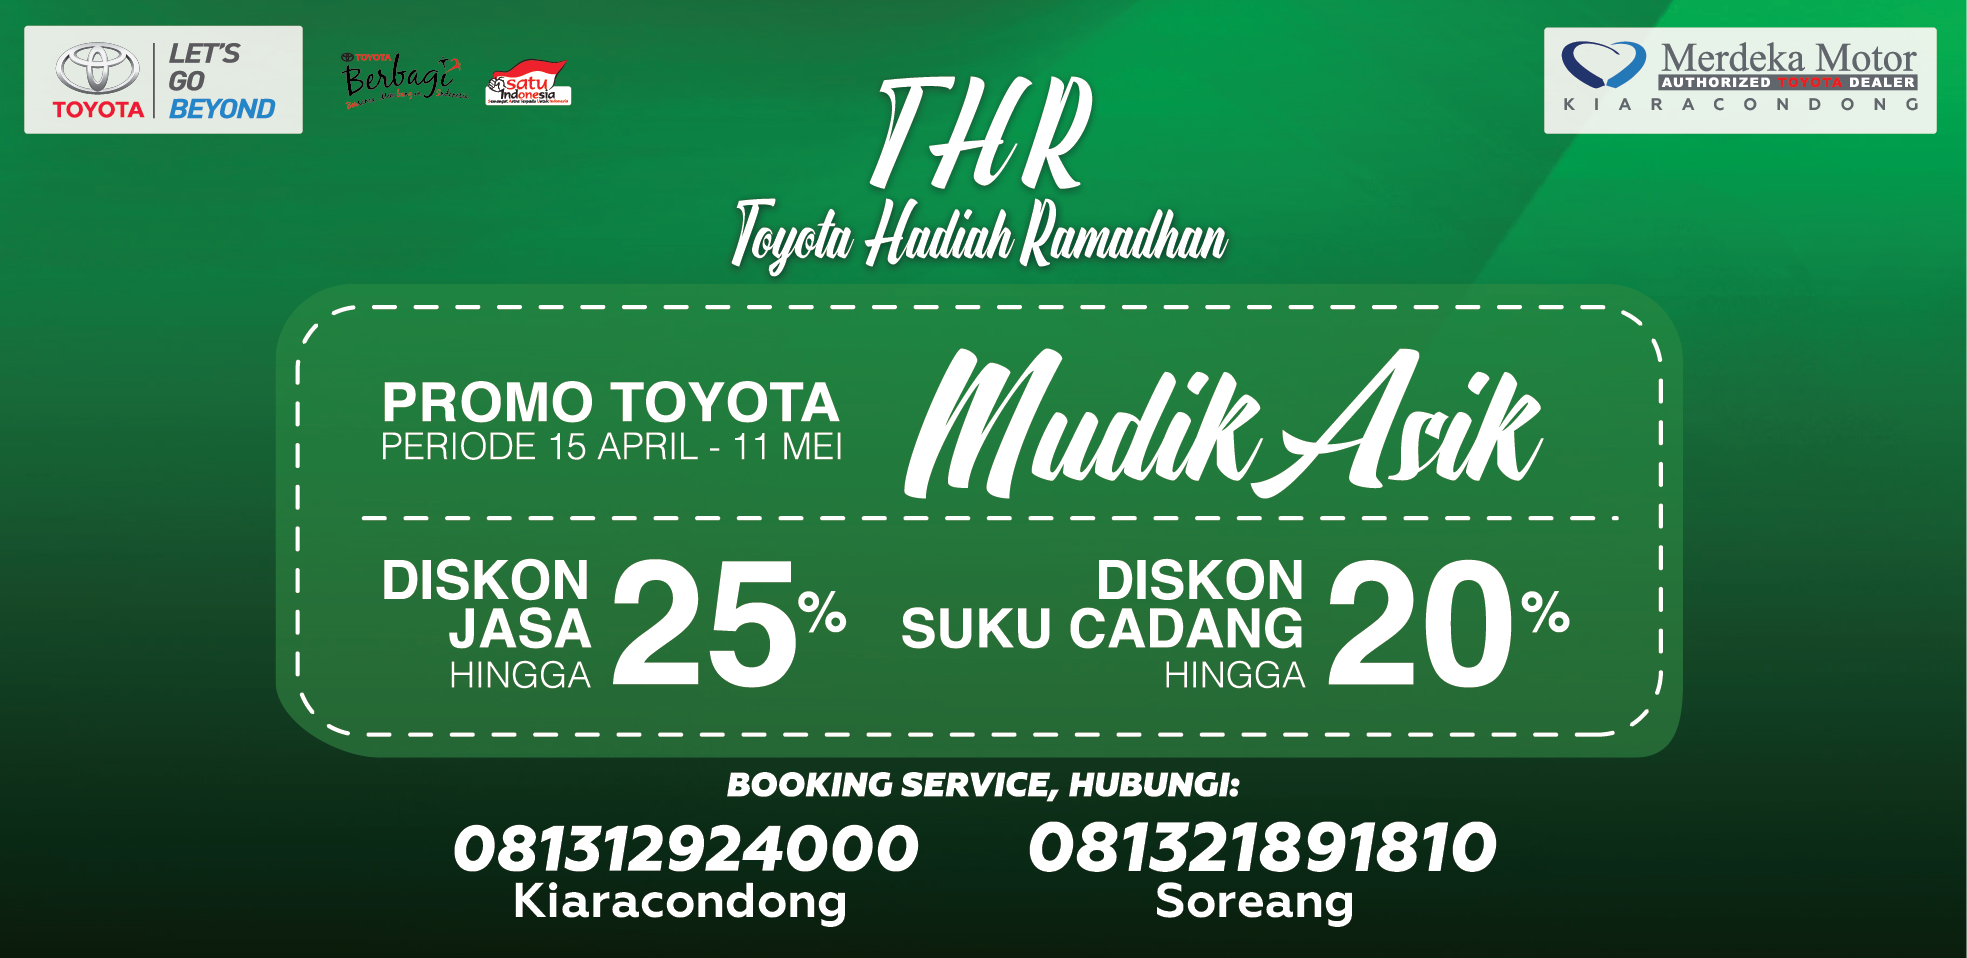 Toyota Merdeka Motor Kiaracondong, Bandung